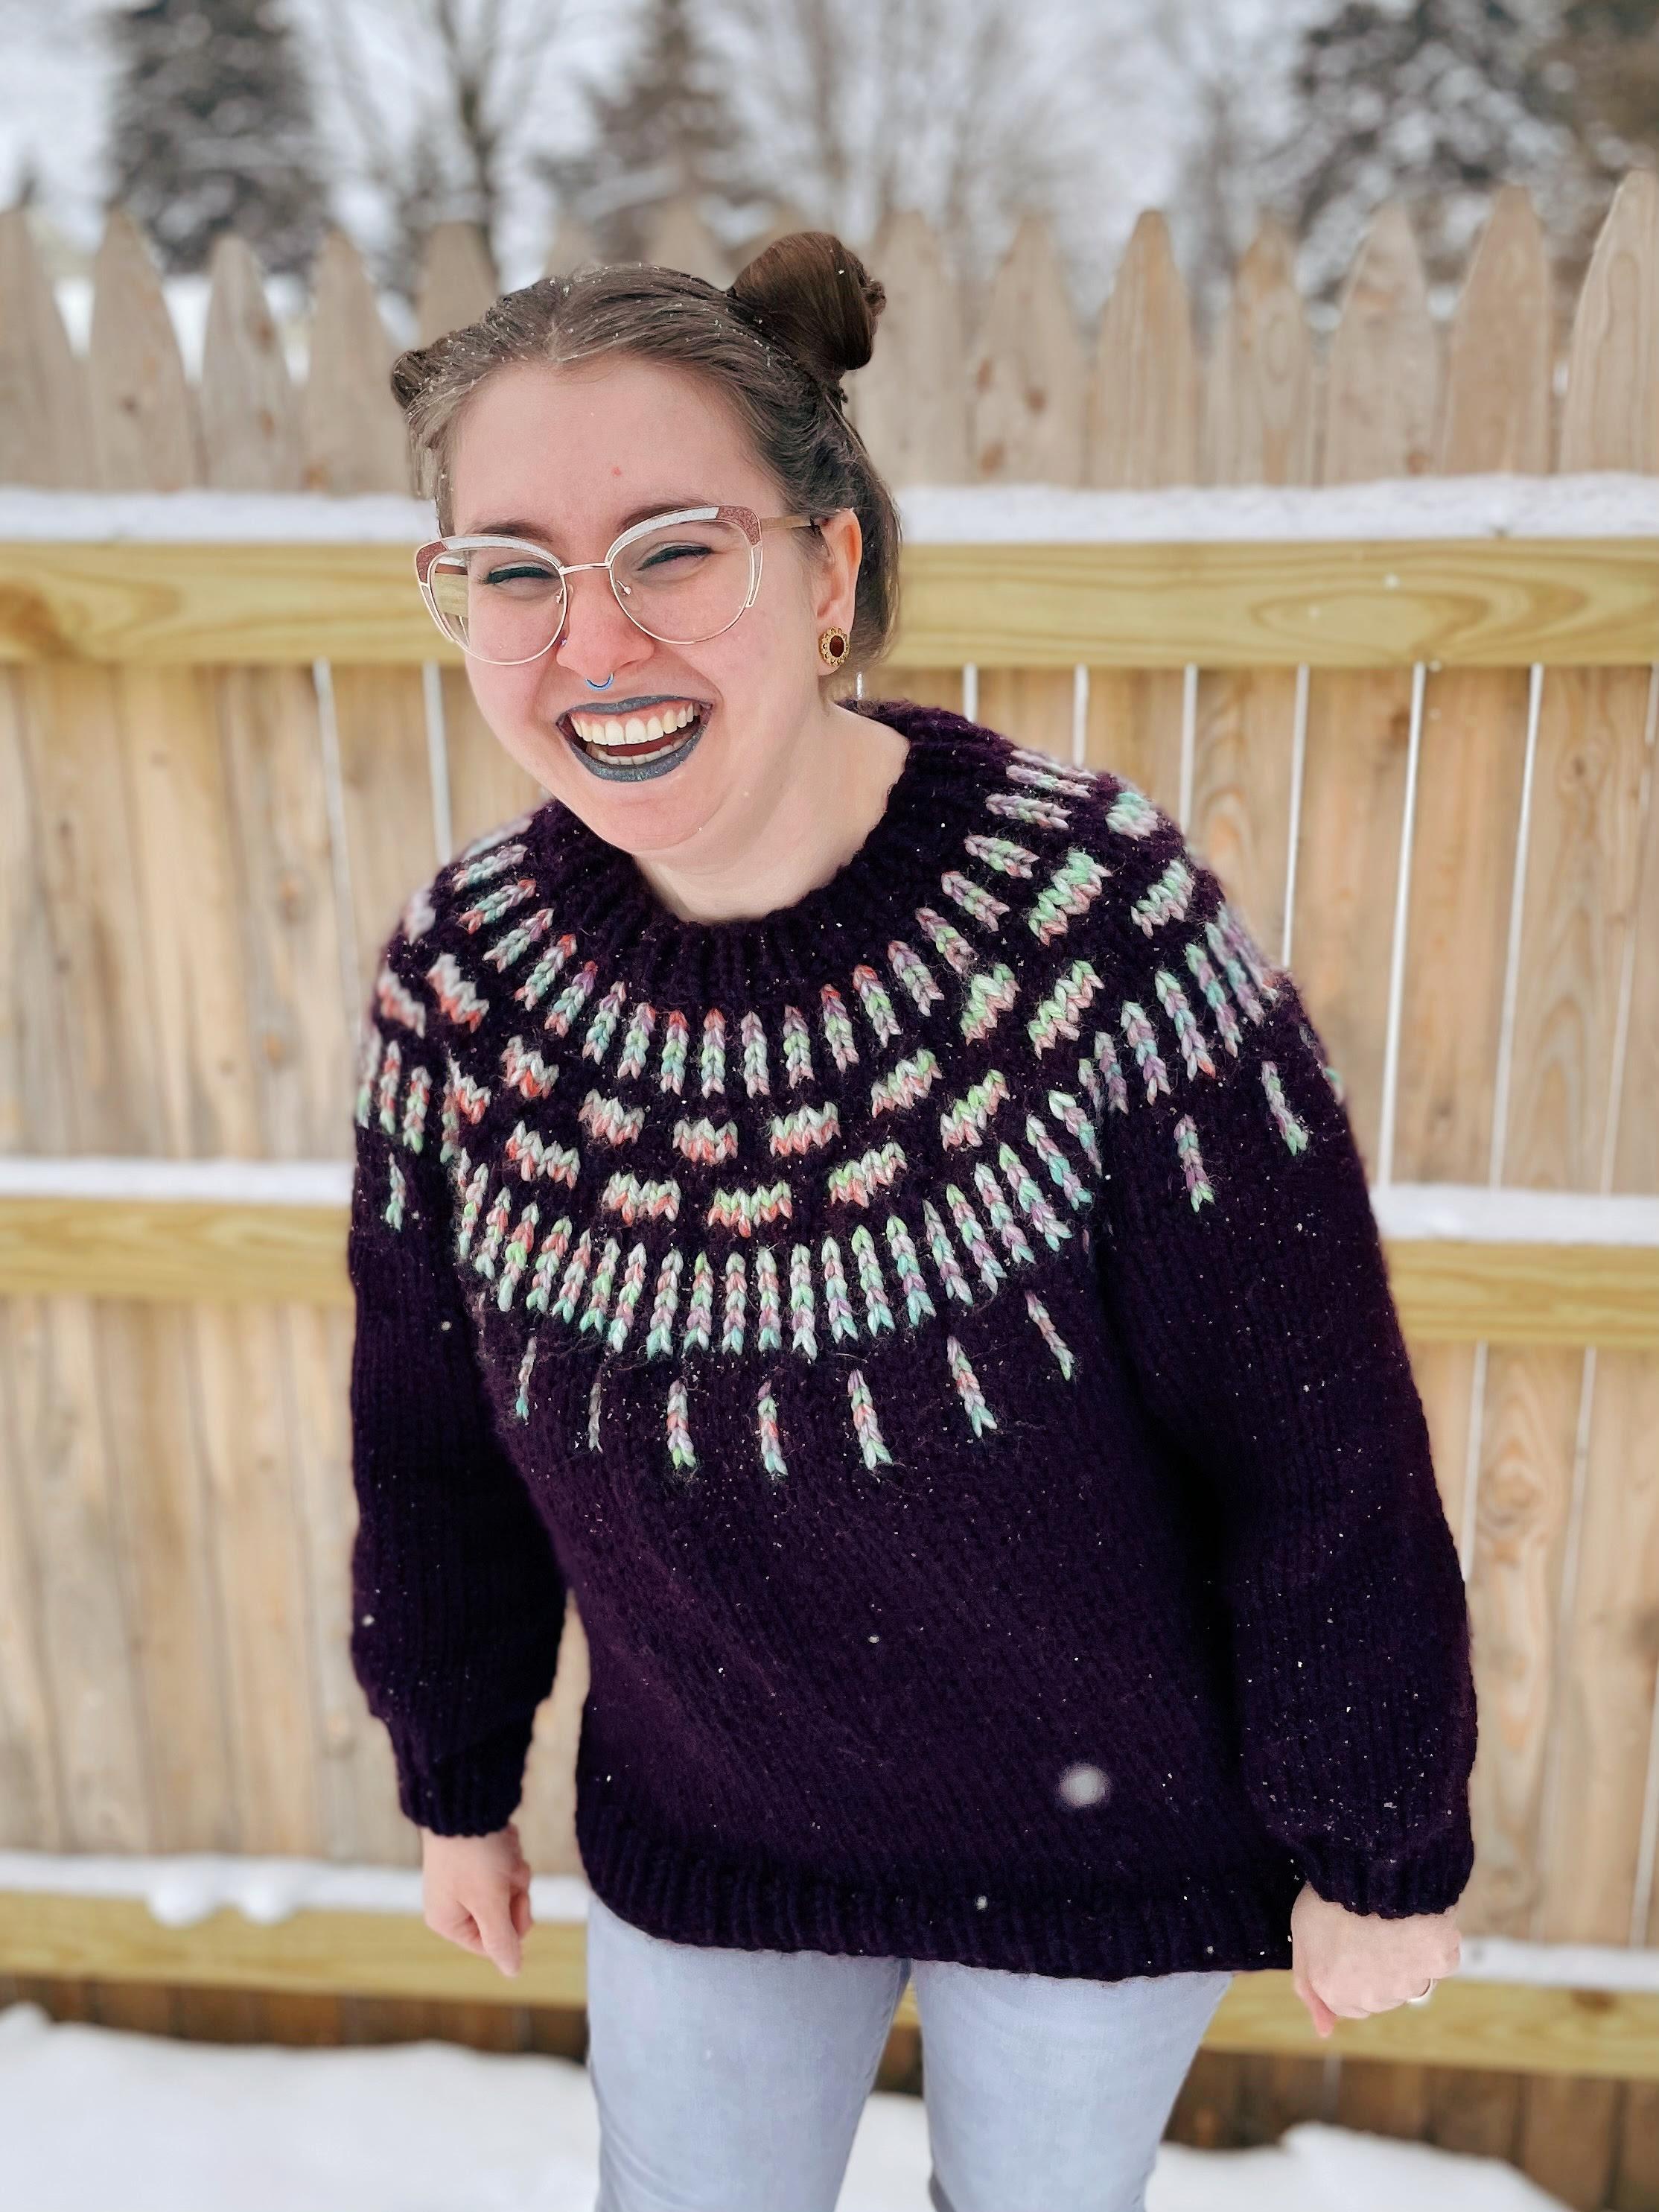 variegated yarn on dark sweater